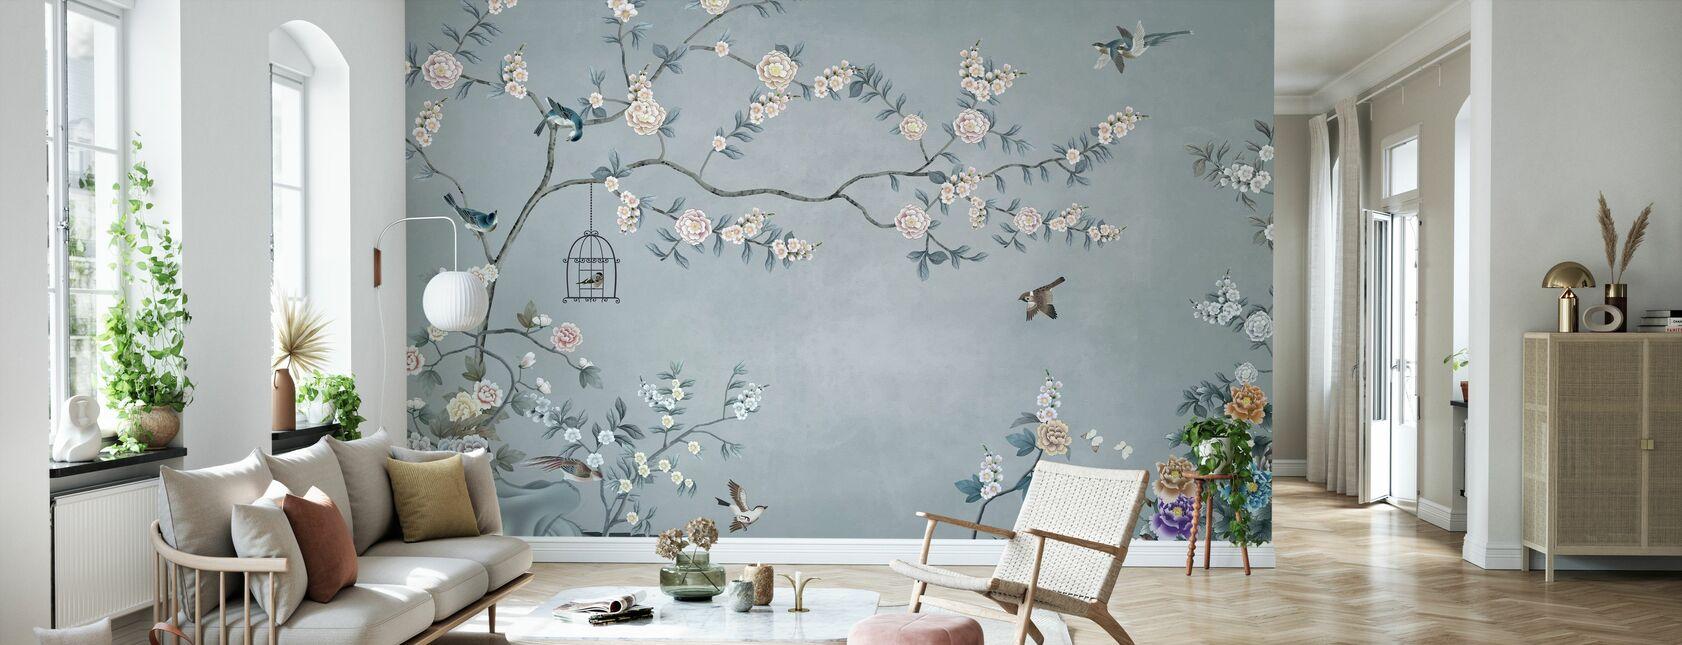 Birds Eden - Wallpaper - Living Room